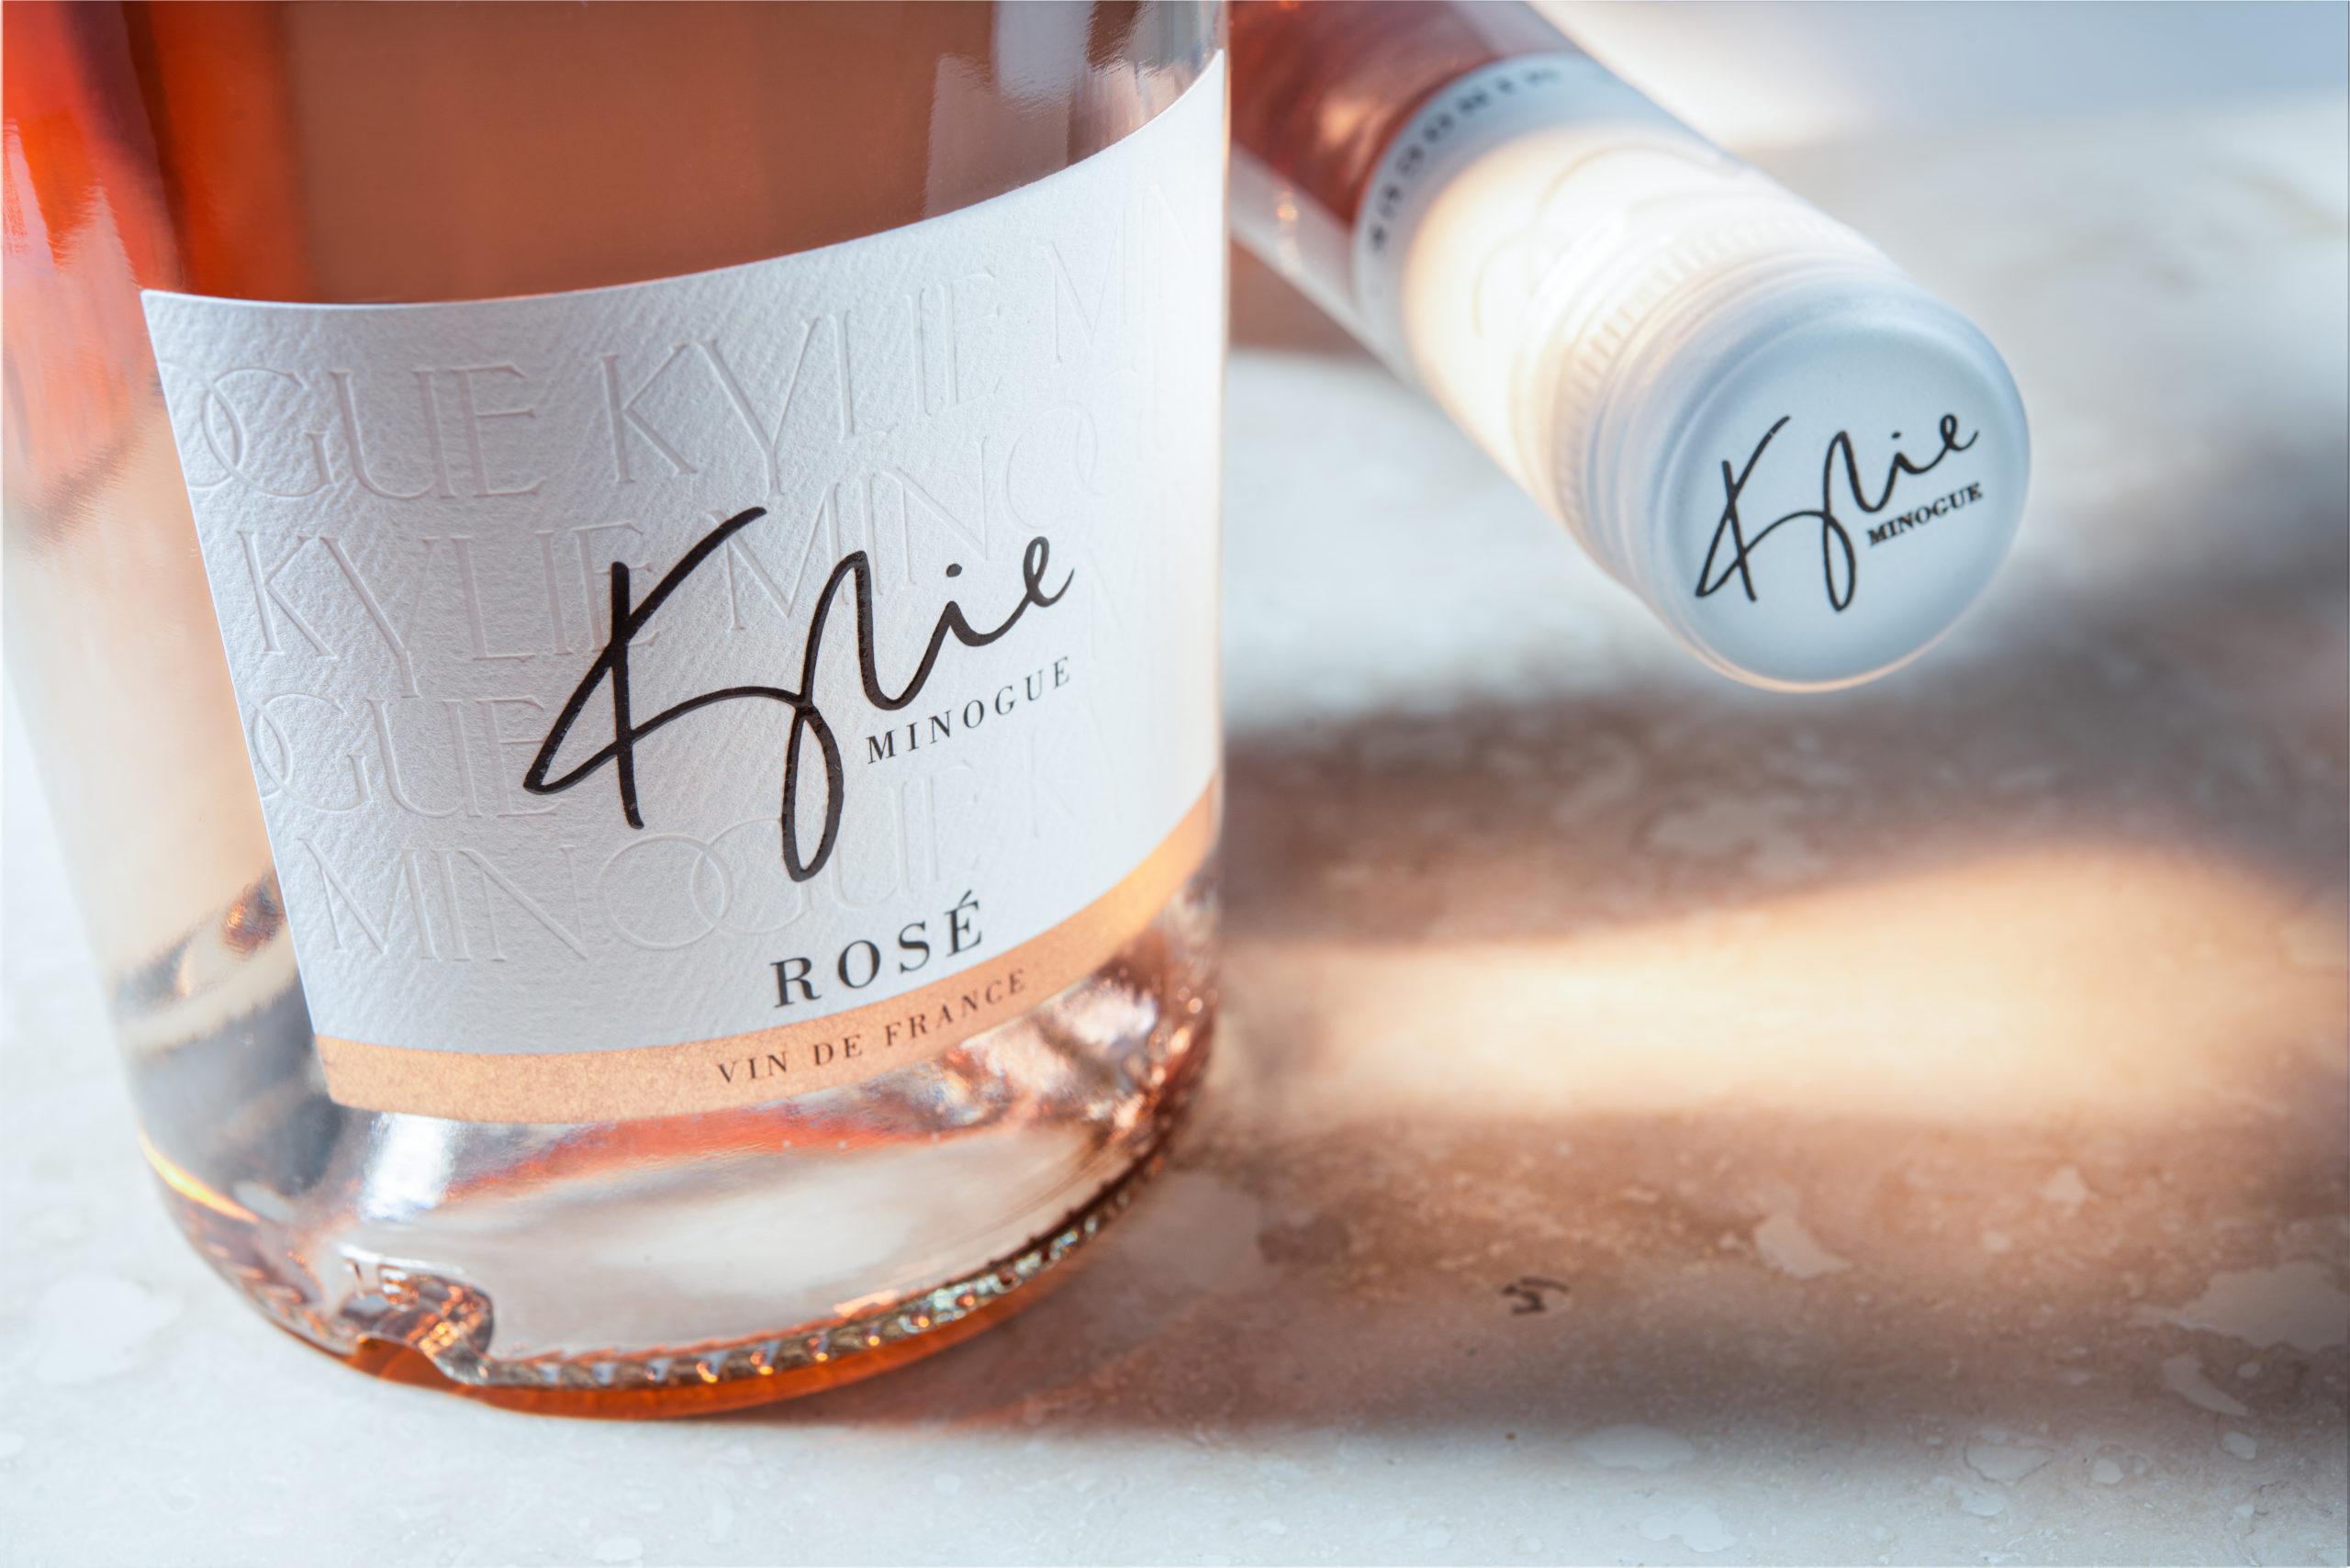 Kylie Minogue Rosé FREE Online Wine Delivered